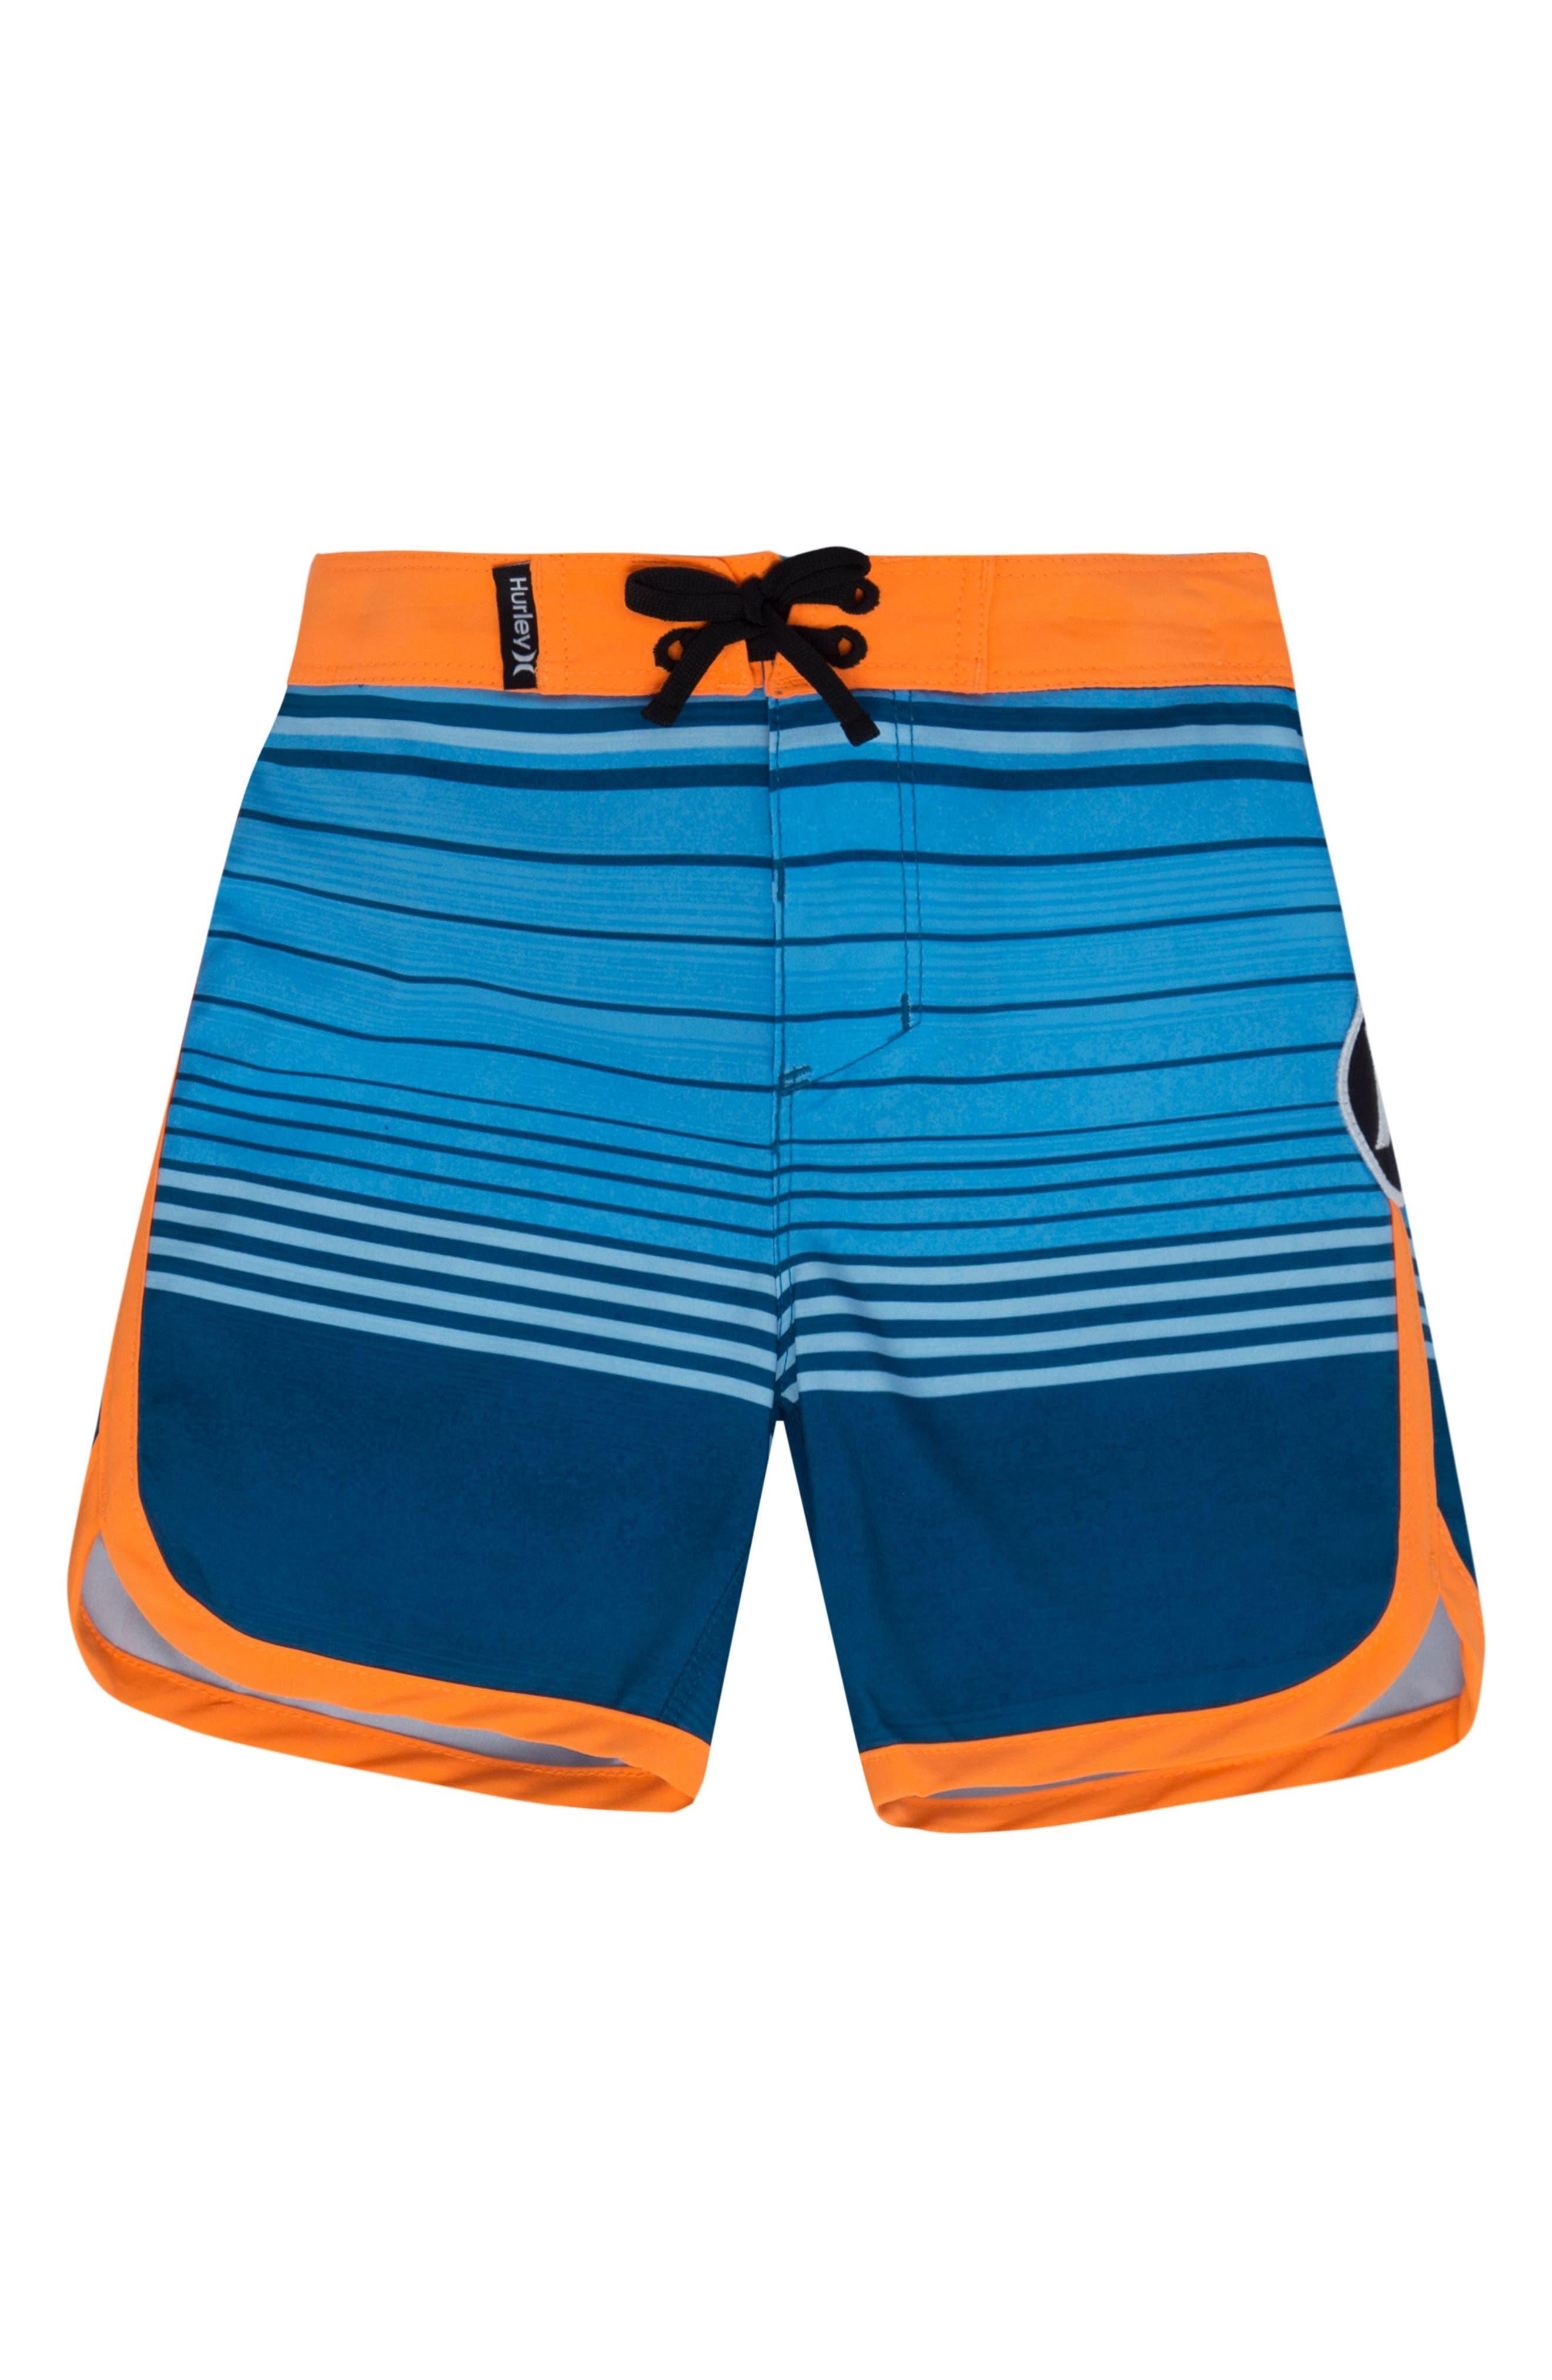 Peter Board Shorts,                         Main,                         color, 453